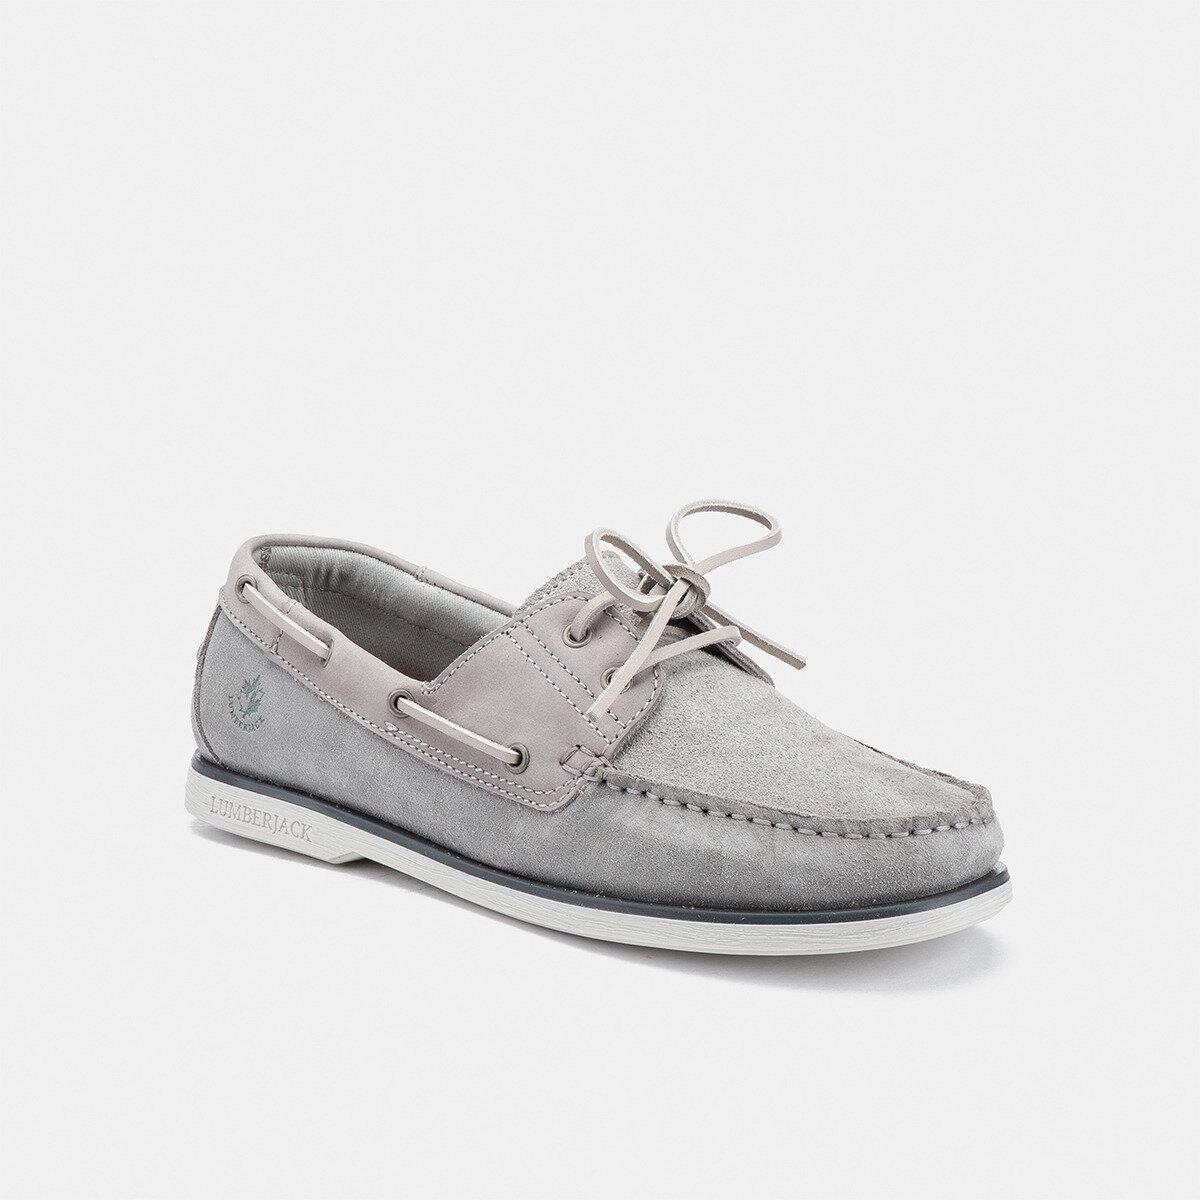 NAVIGATOR ASH GREY/CIMENT GREY Man Boat shoes